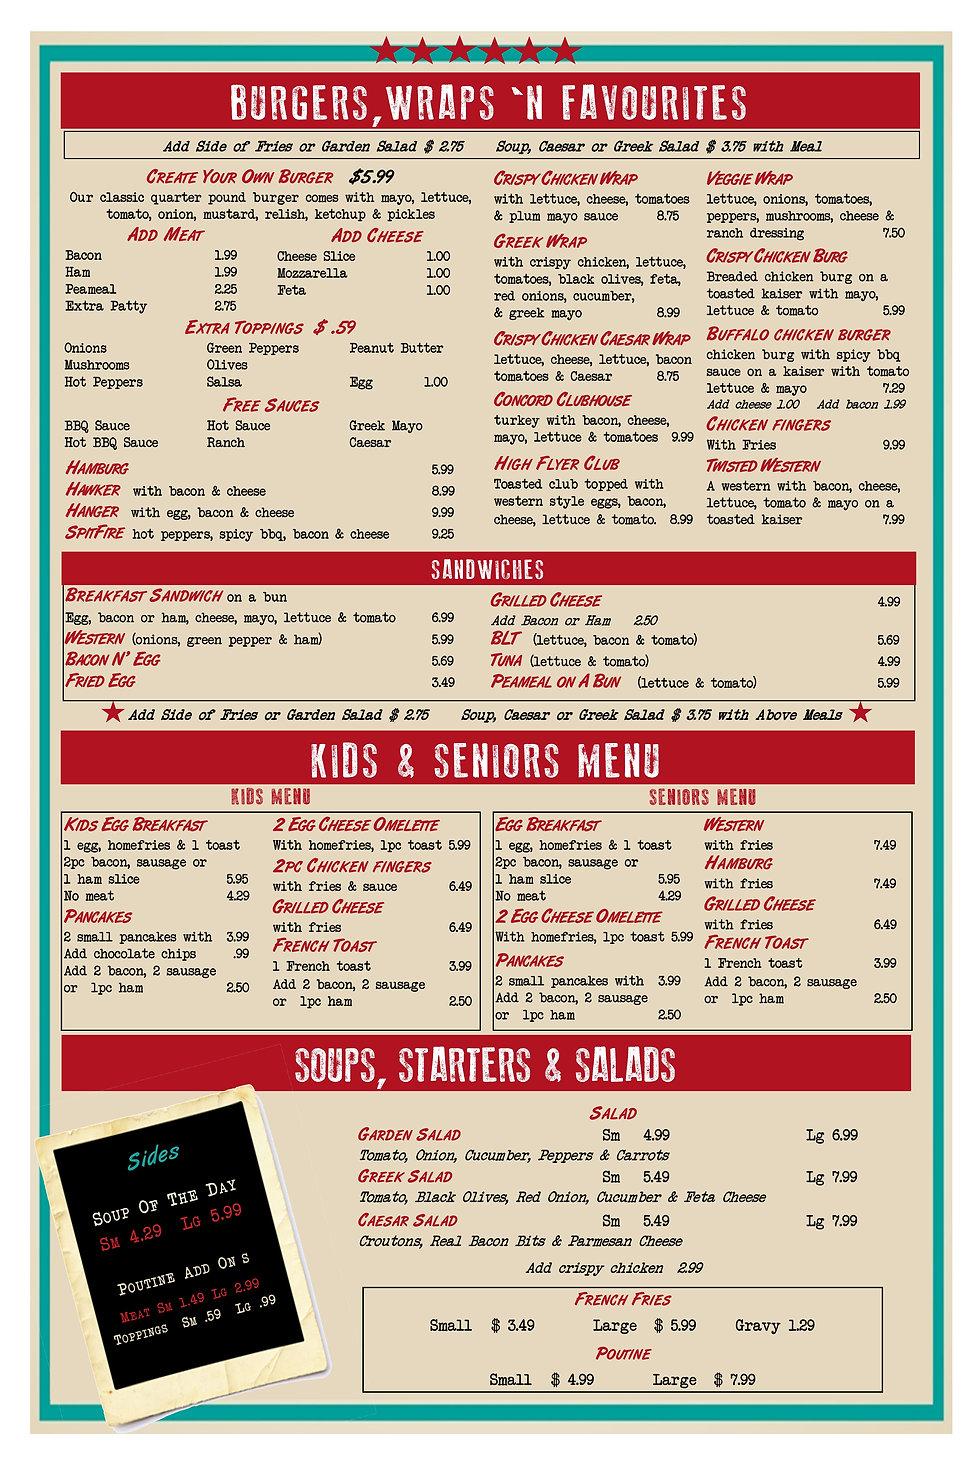 Brantford Lunch Menu July 2020.jpg